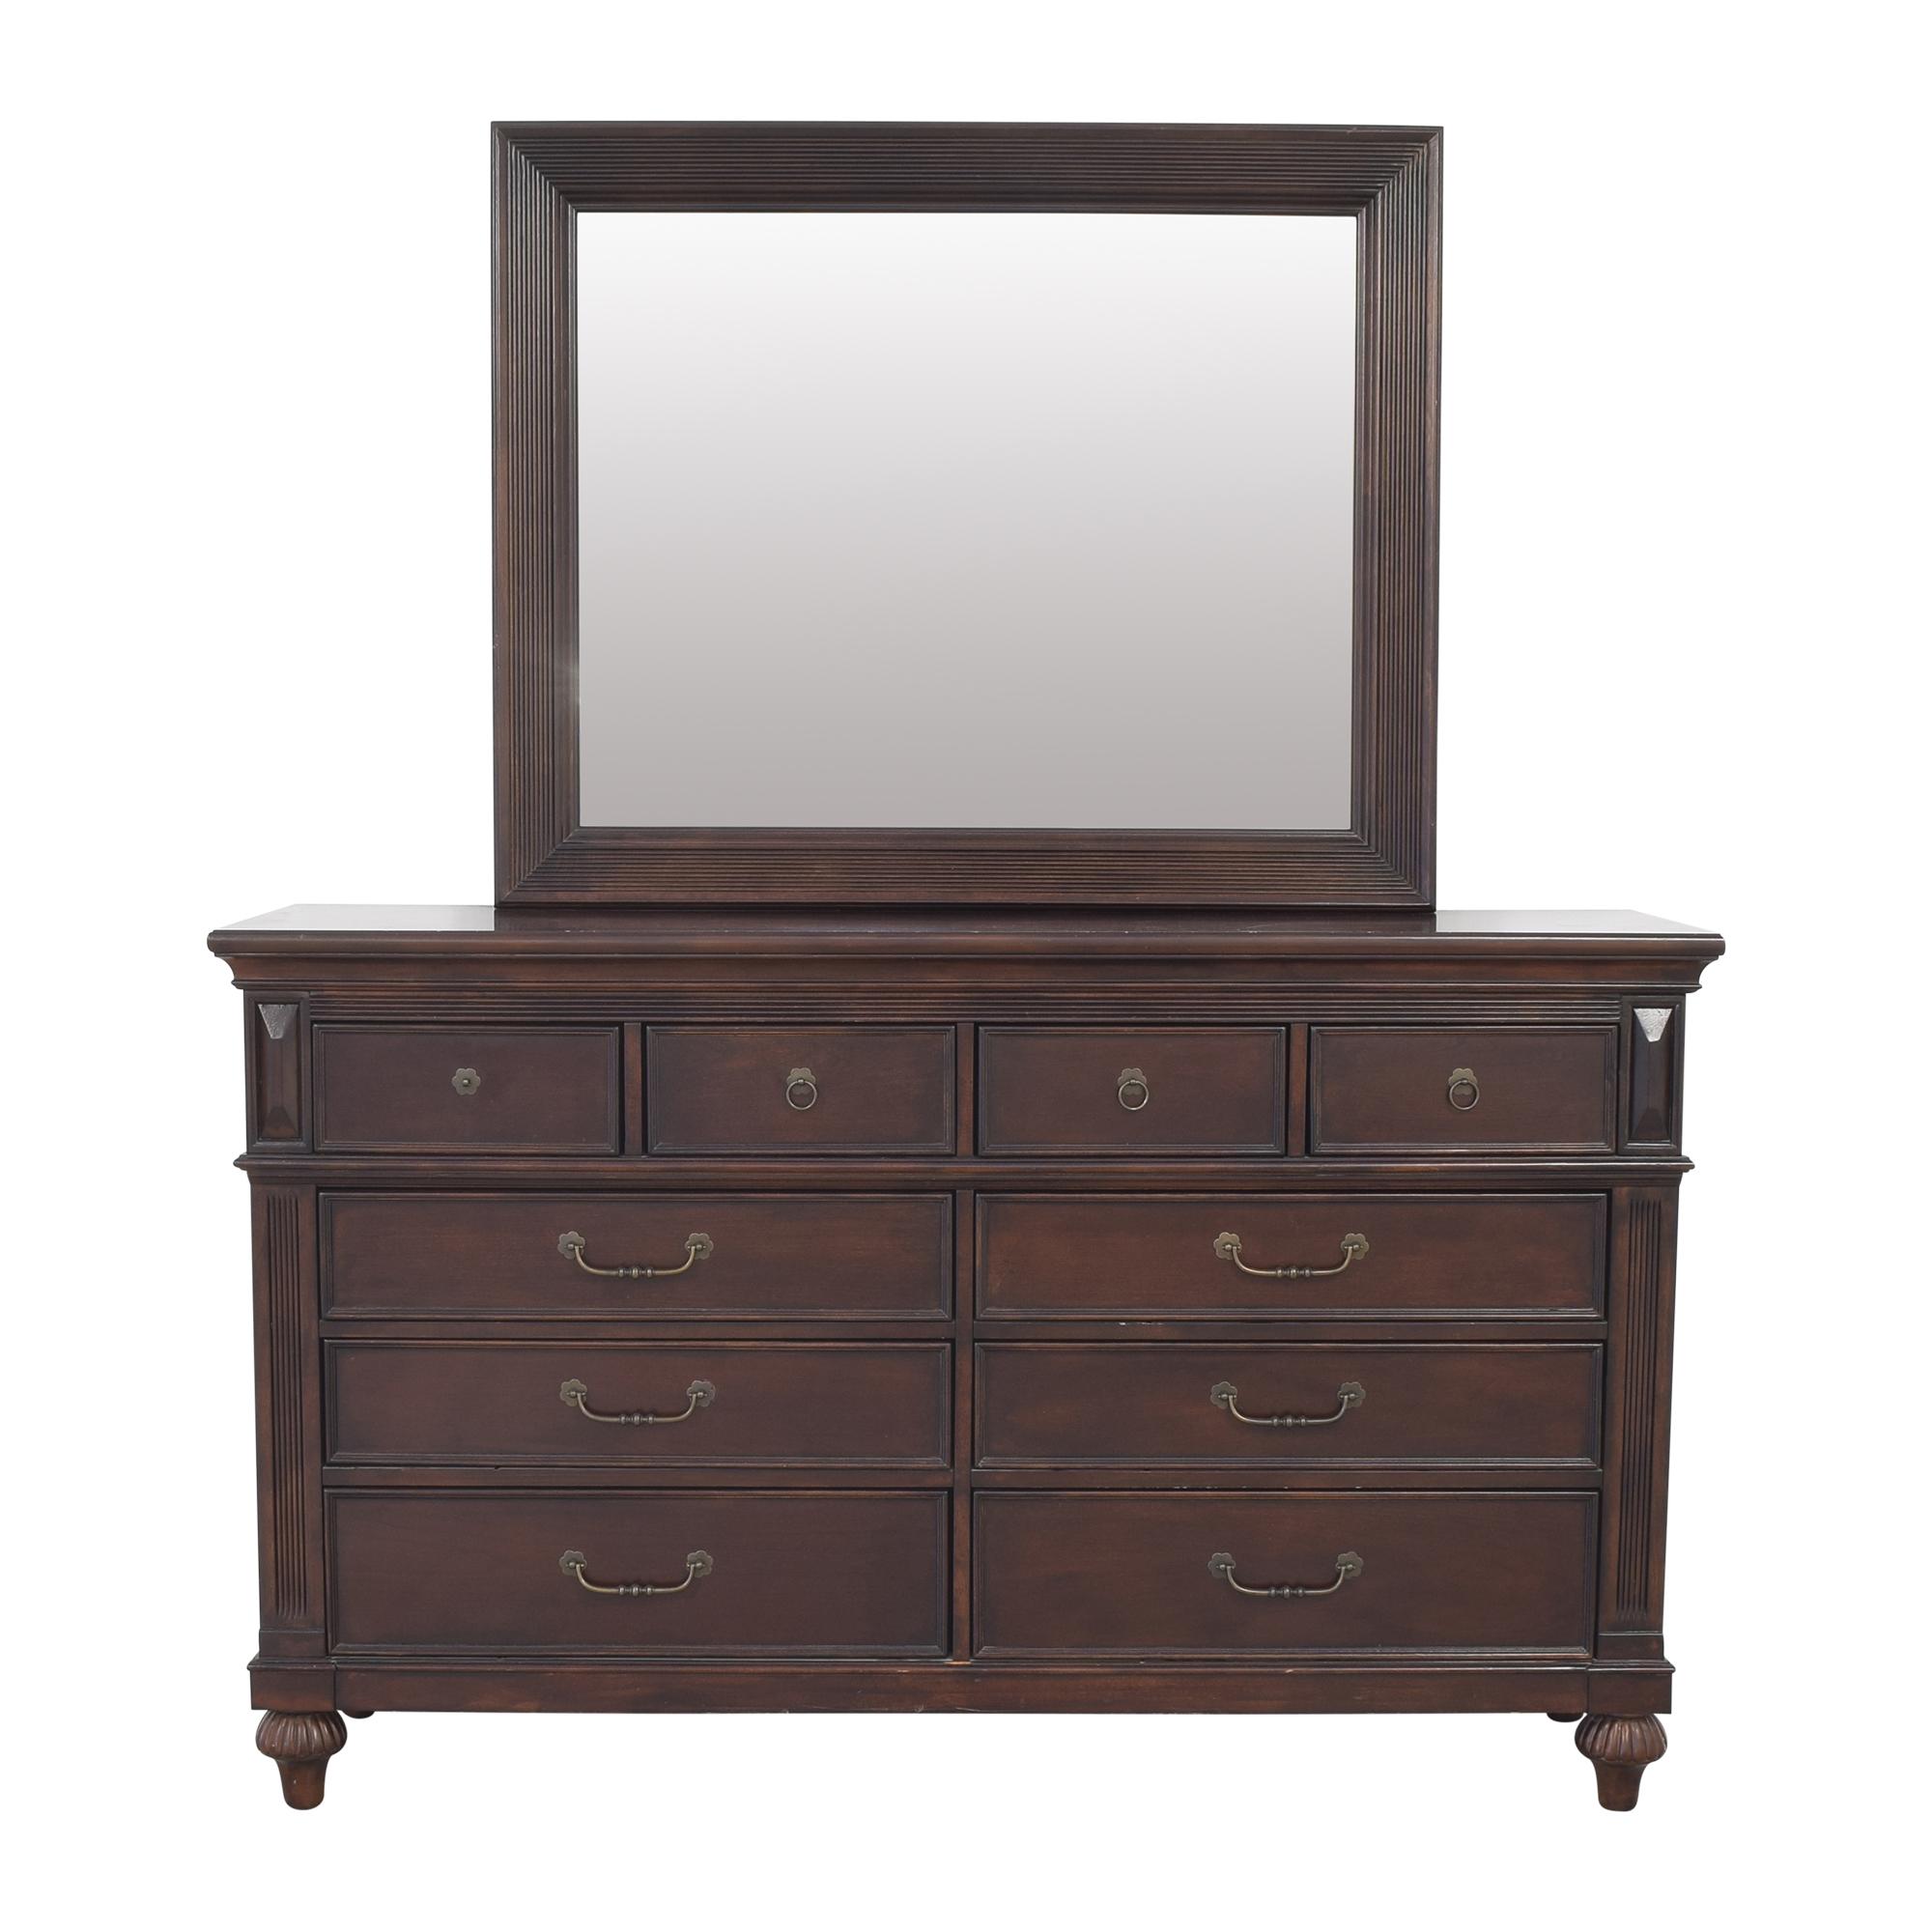 buy Klaussner Wide Dresser and Mirror Klaussner Dressers